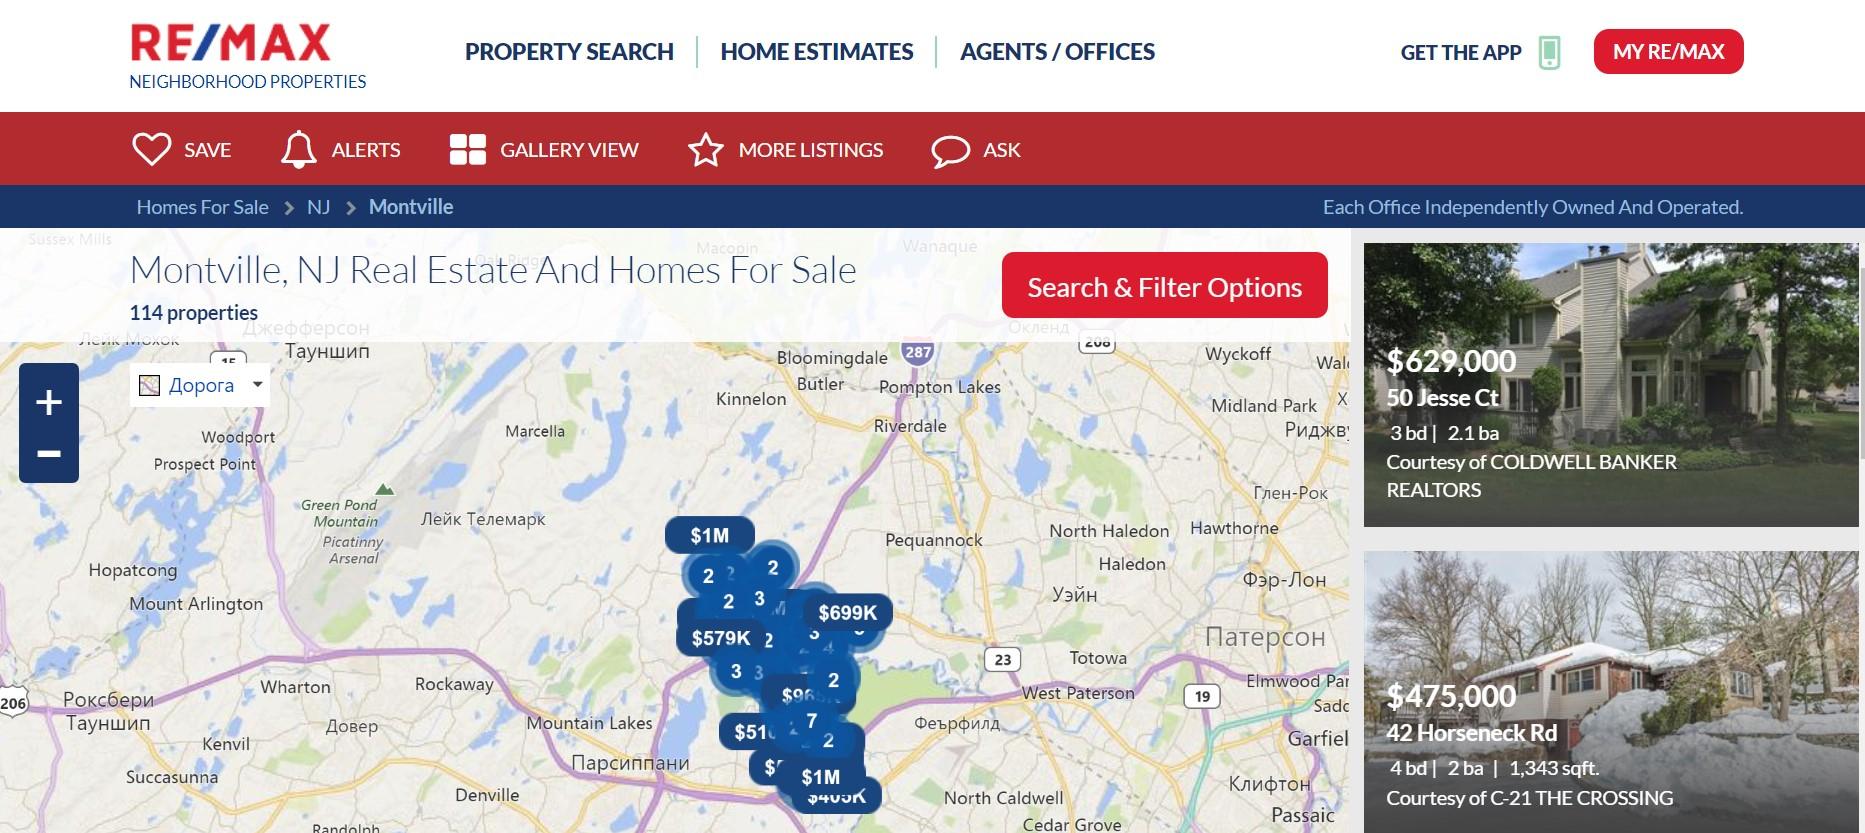 remax property search